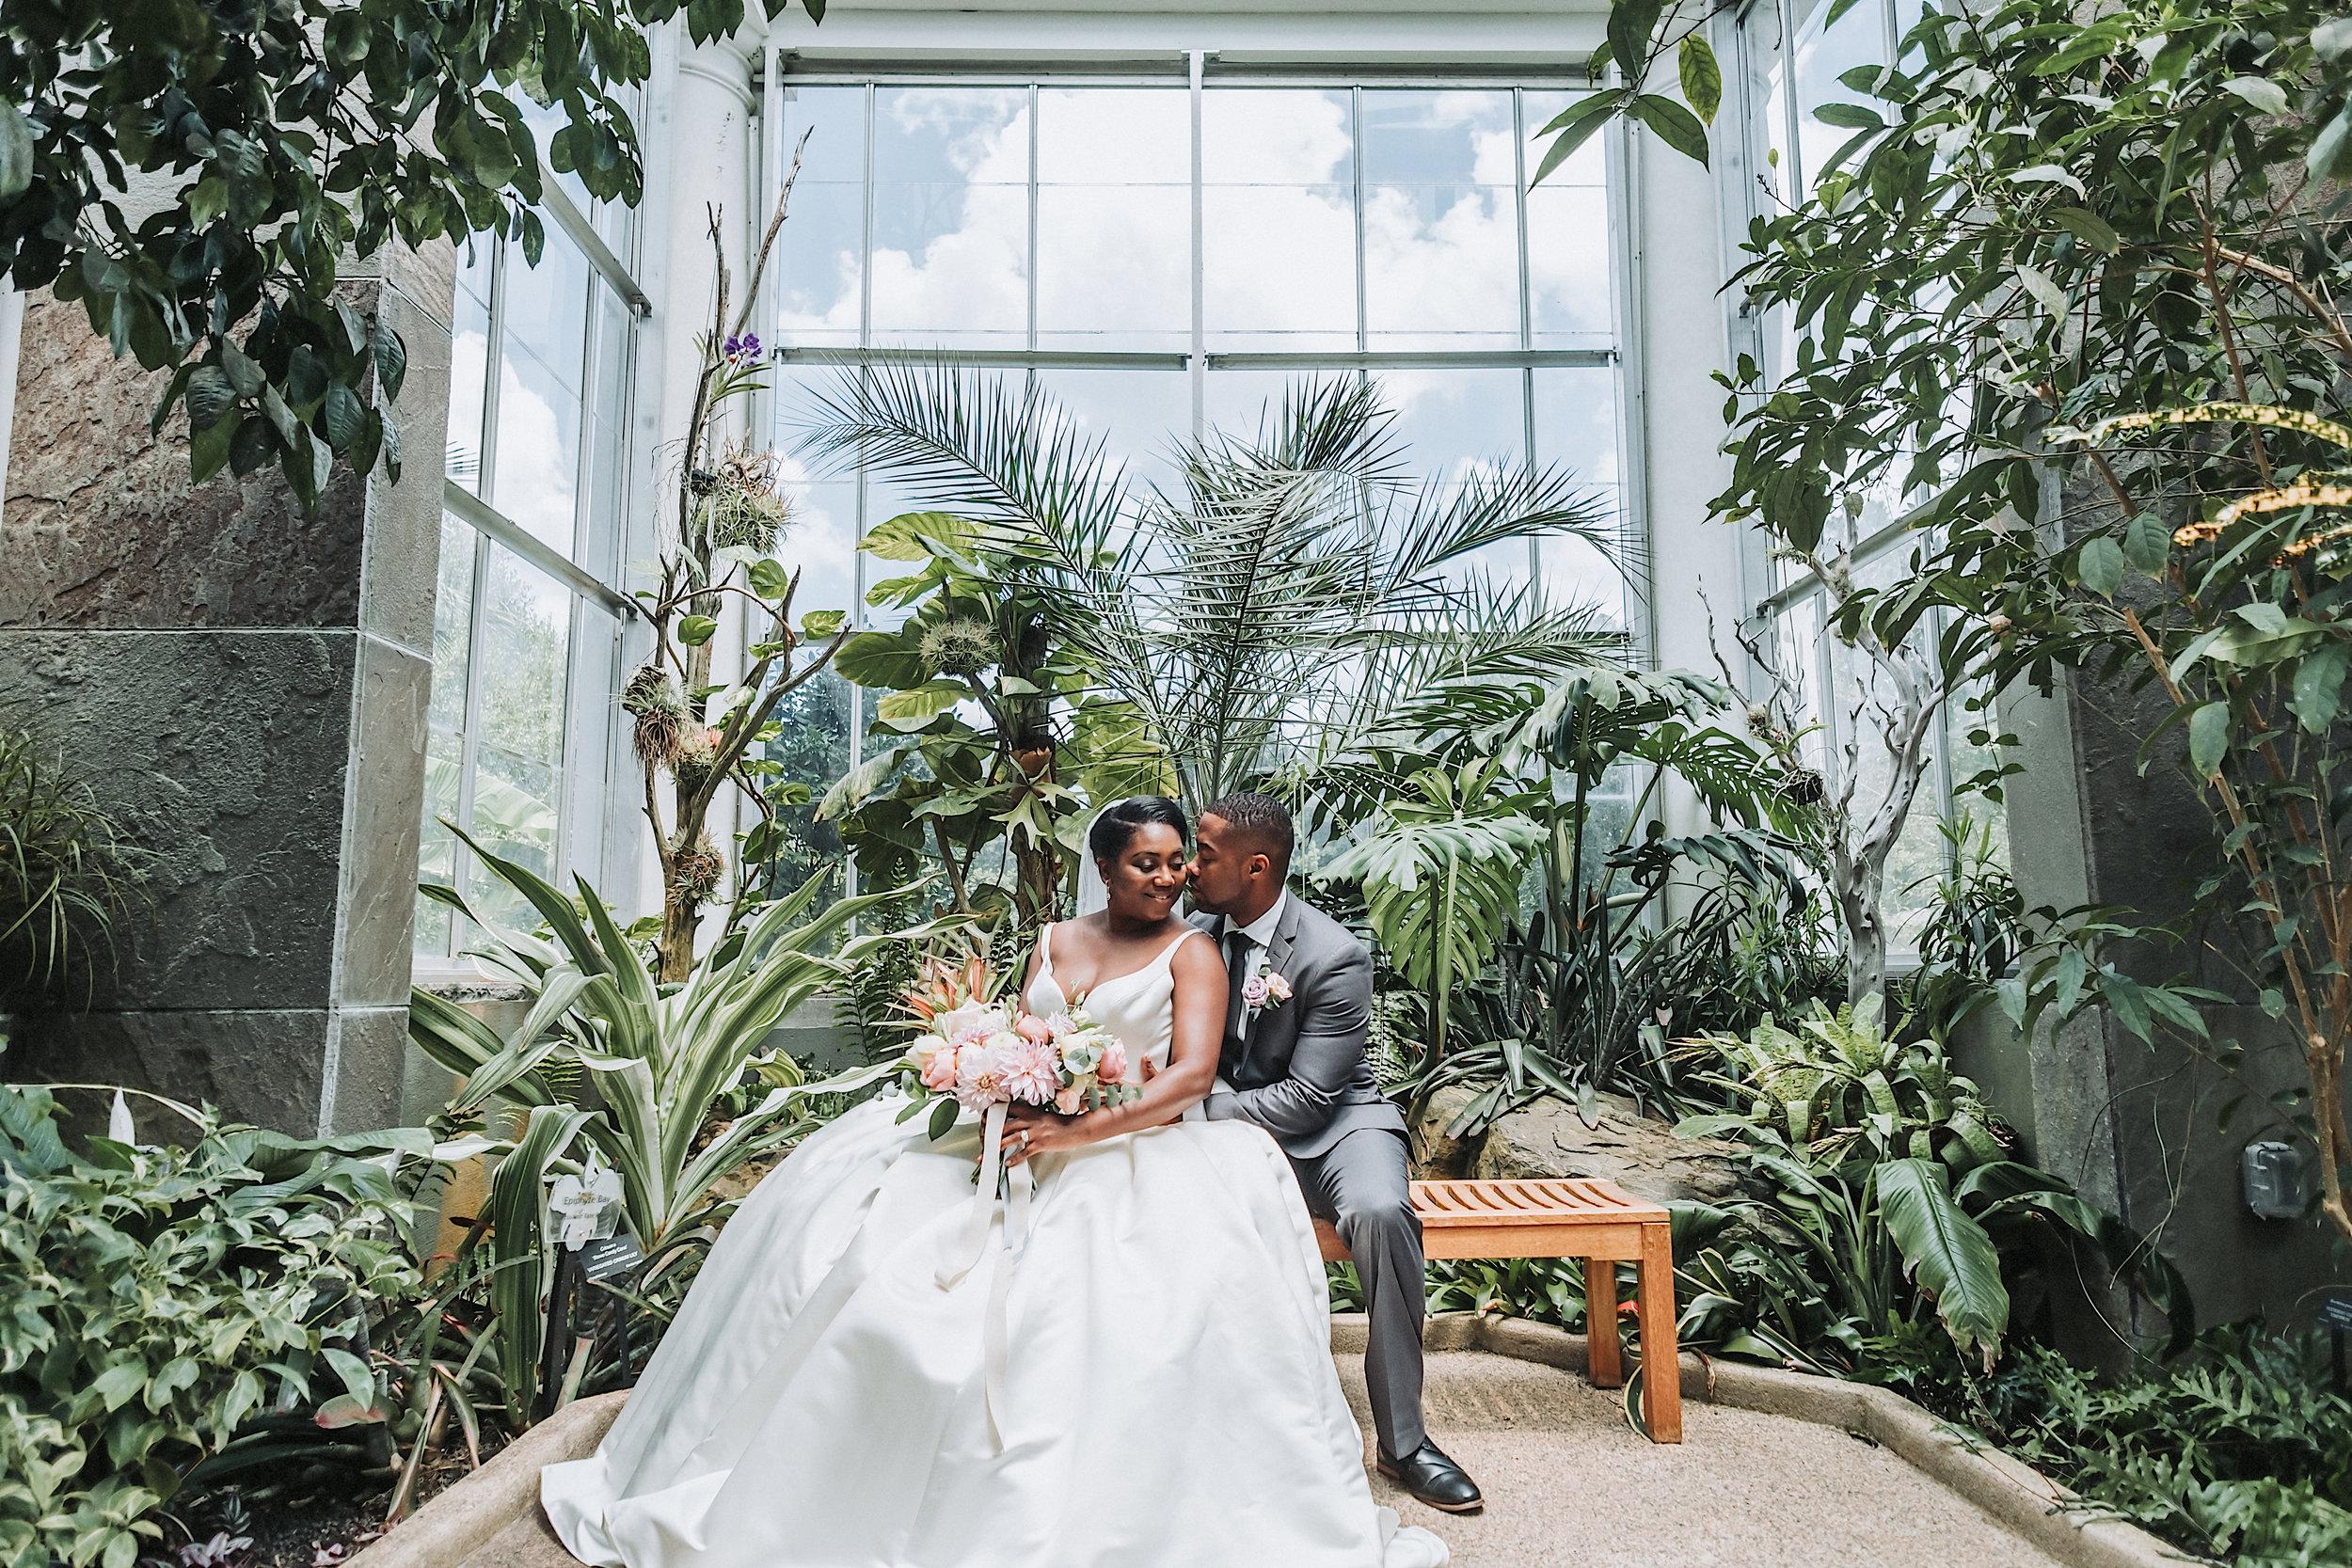 daniel-stowe-botanical-garden-wedding-modern-luxury-garden-QJ04.jpg